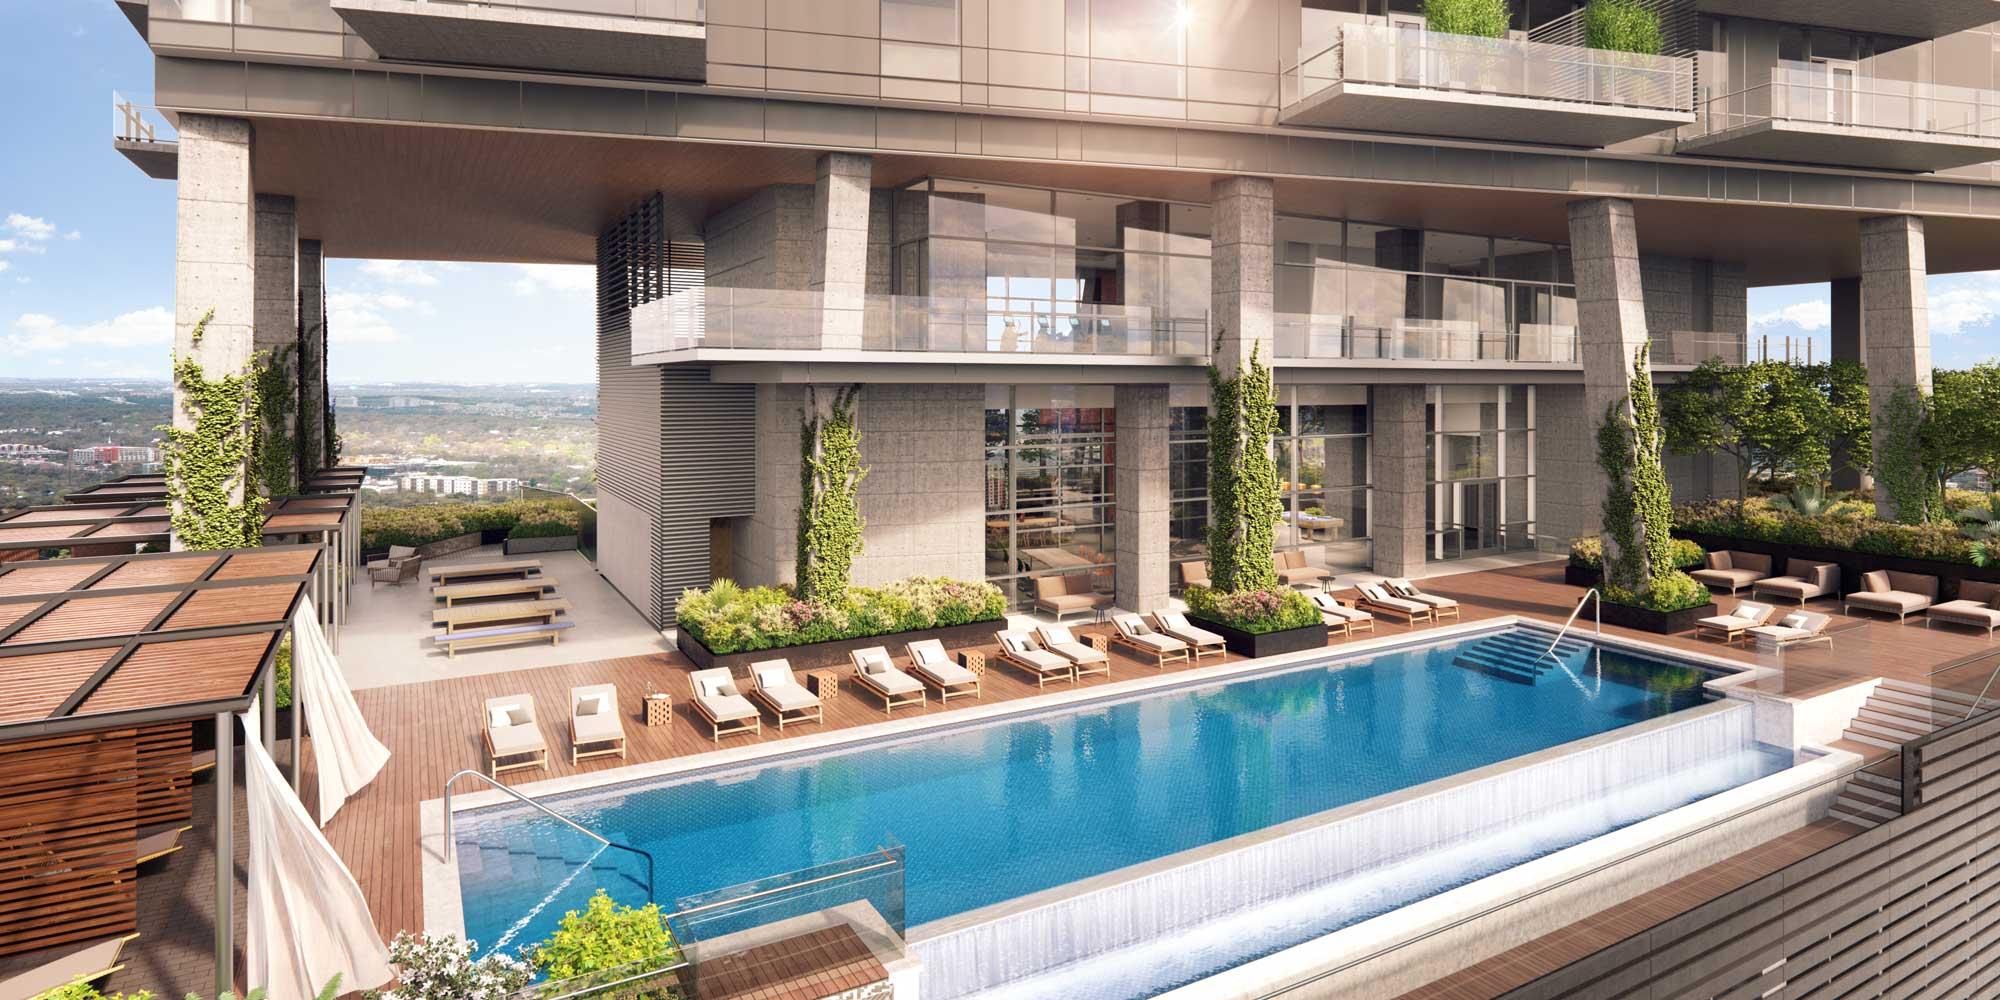 Sundeck Featuring Infinity Edge Pool & Cabanas